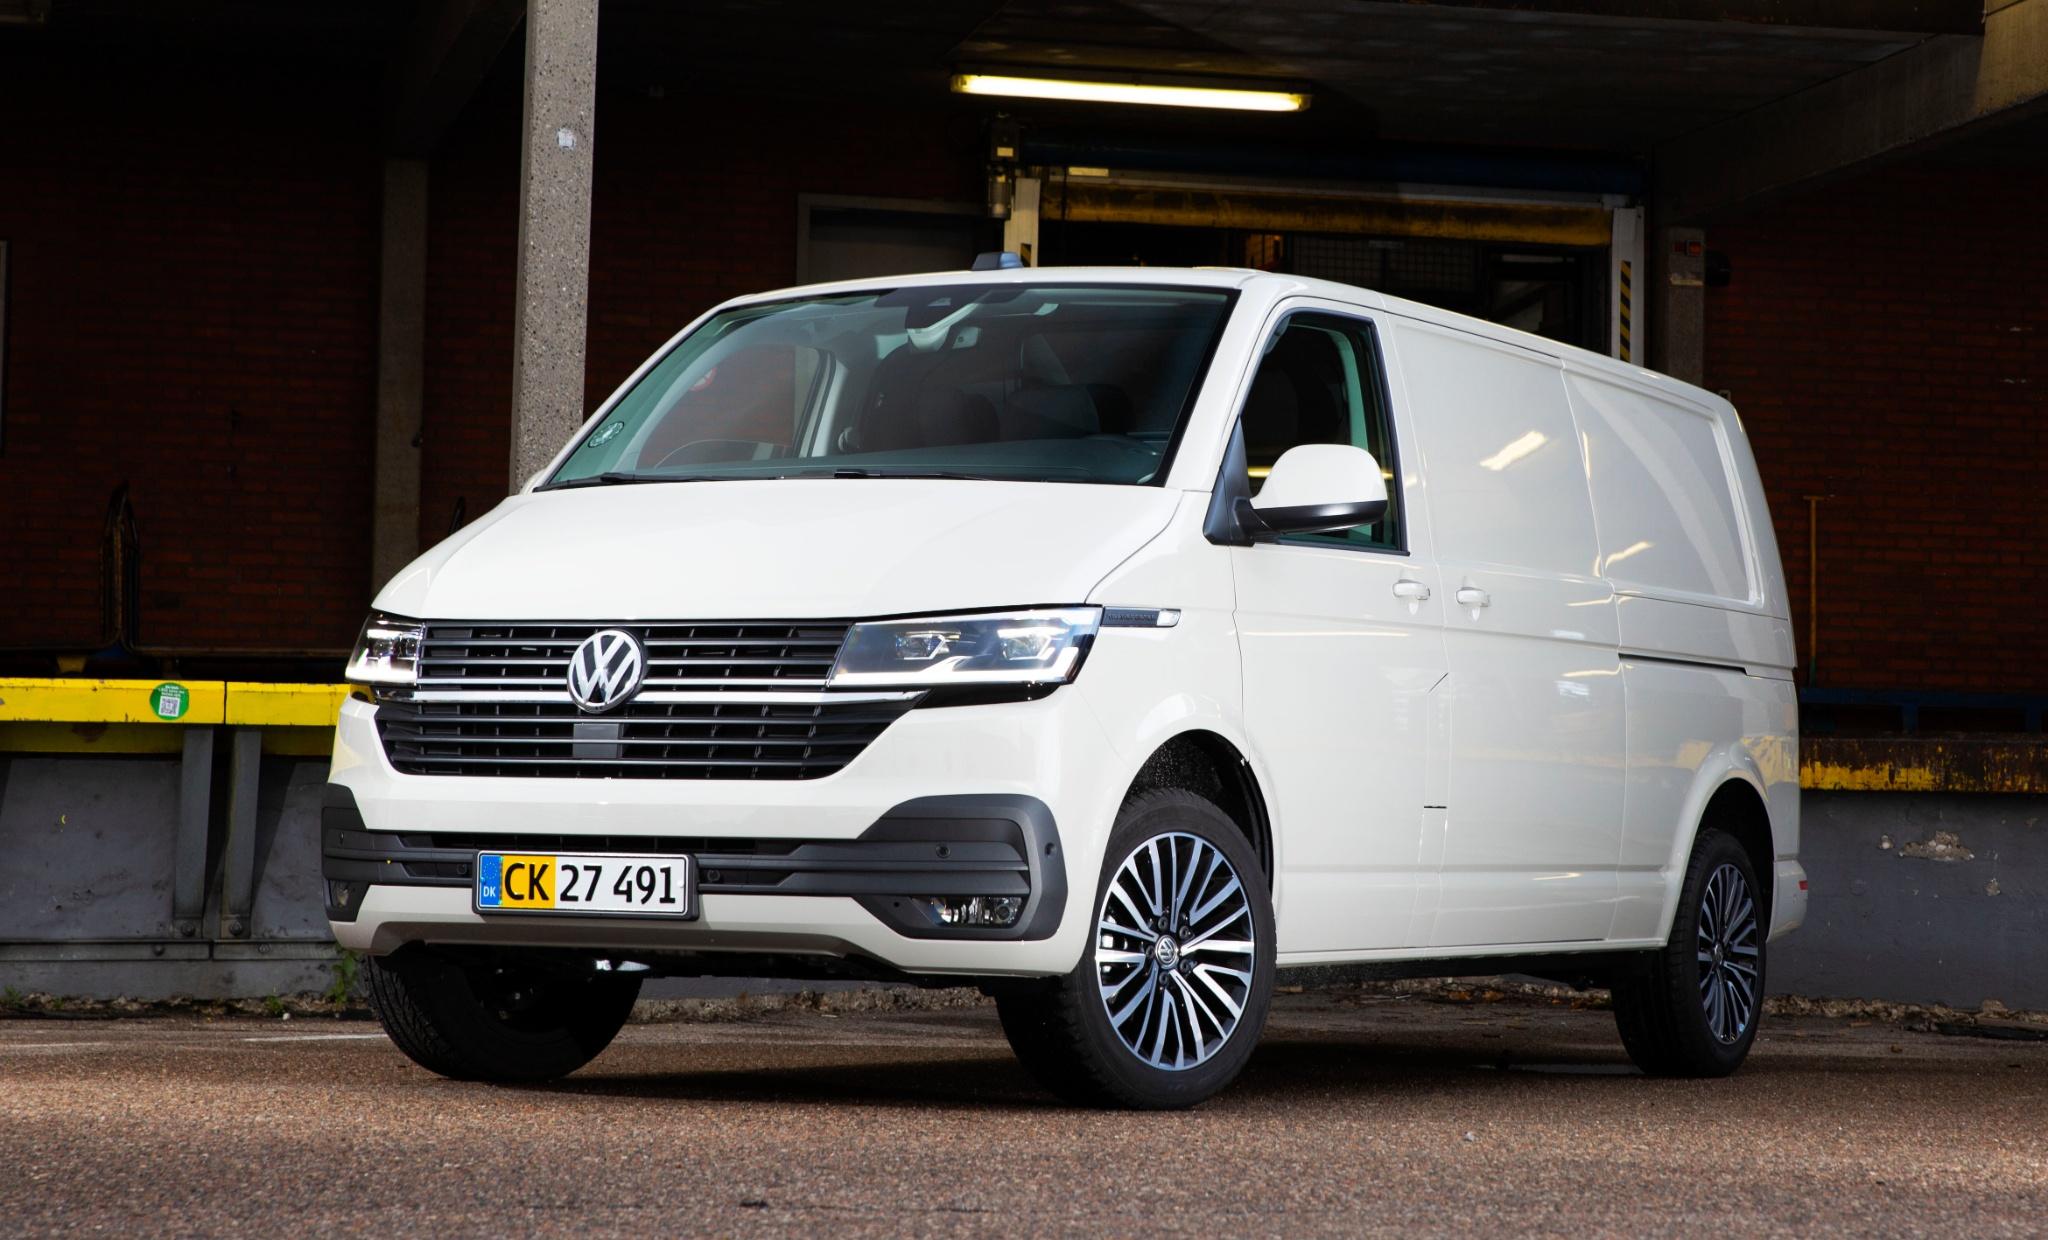 Billede 3 - Volkswagen Transporter 61